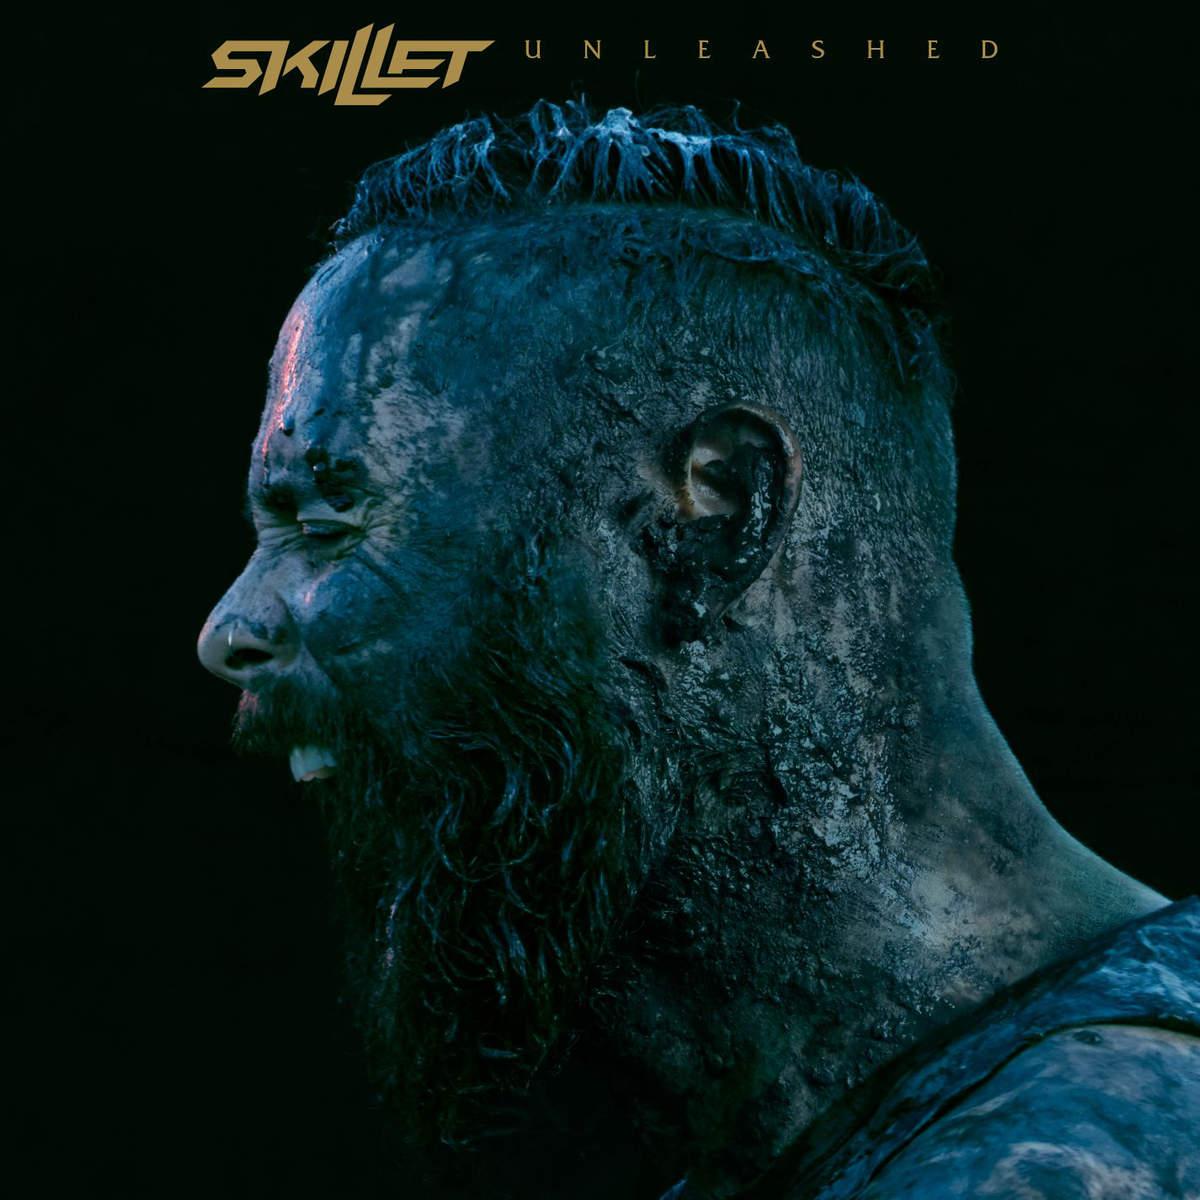 Skillet unleashed beyond [special edition] (2017) mp3 скачать.